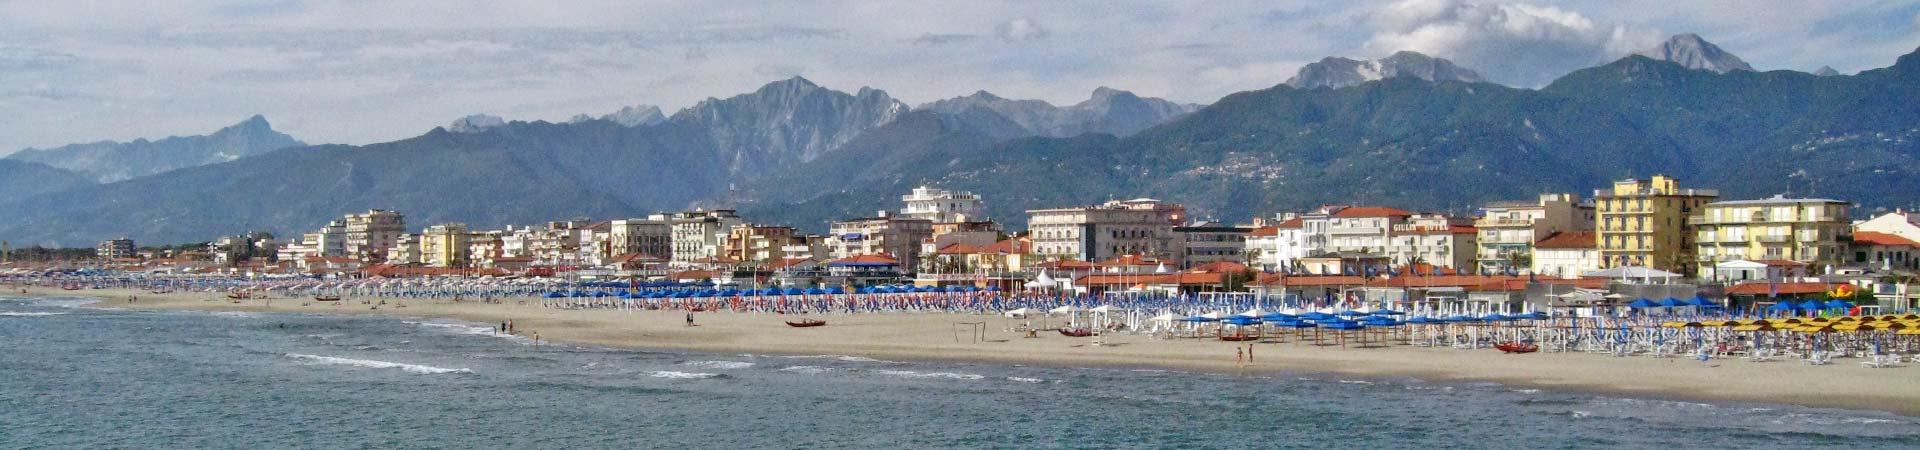 Weather Forecast - Hotel Giardino